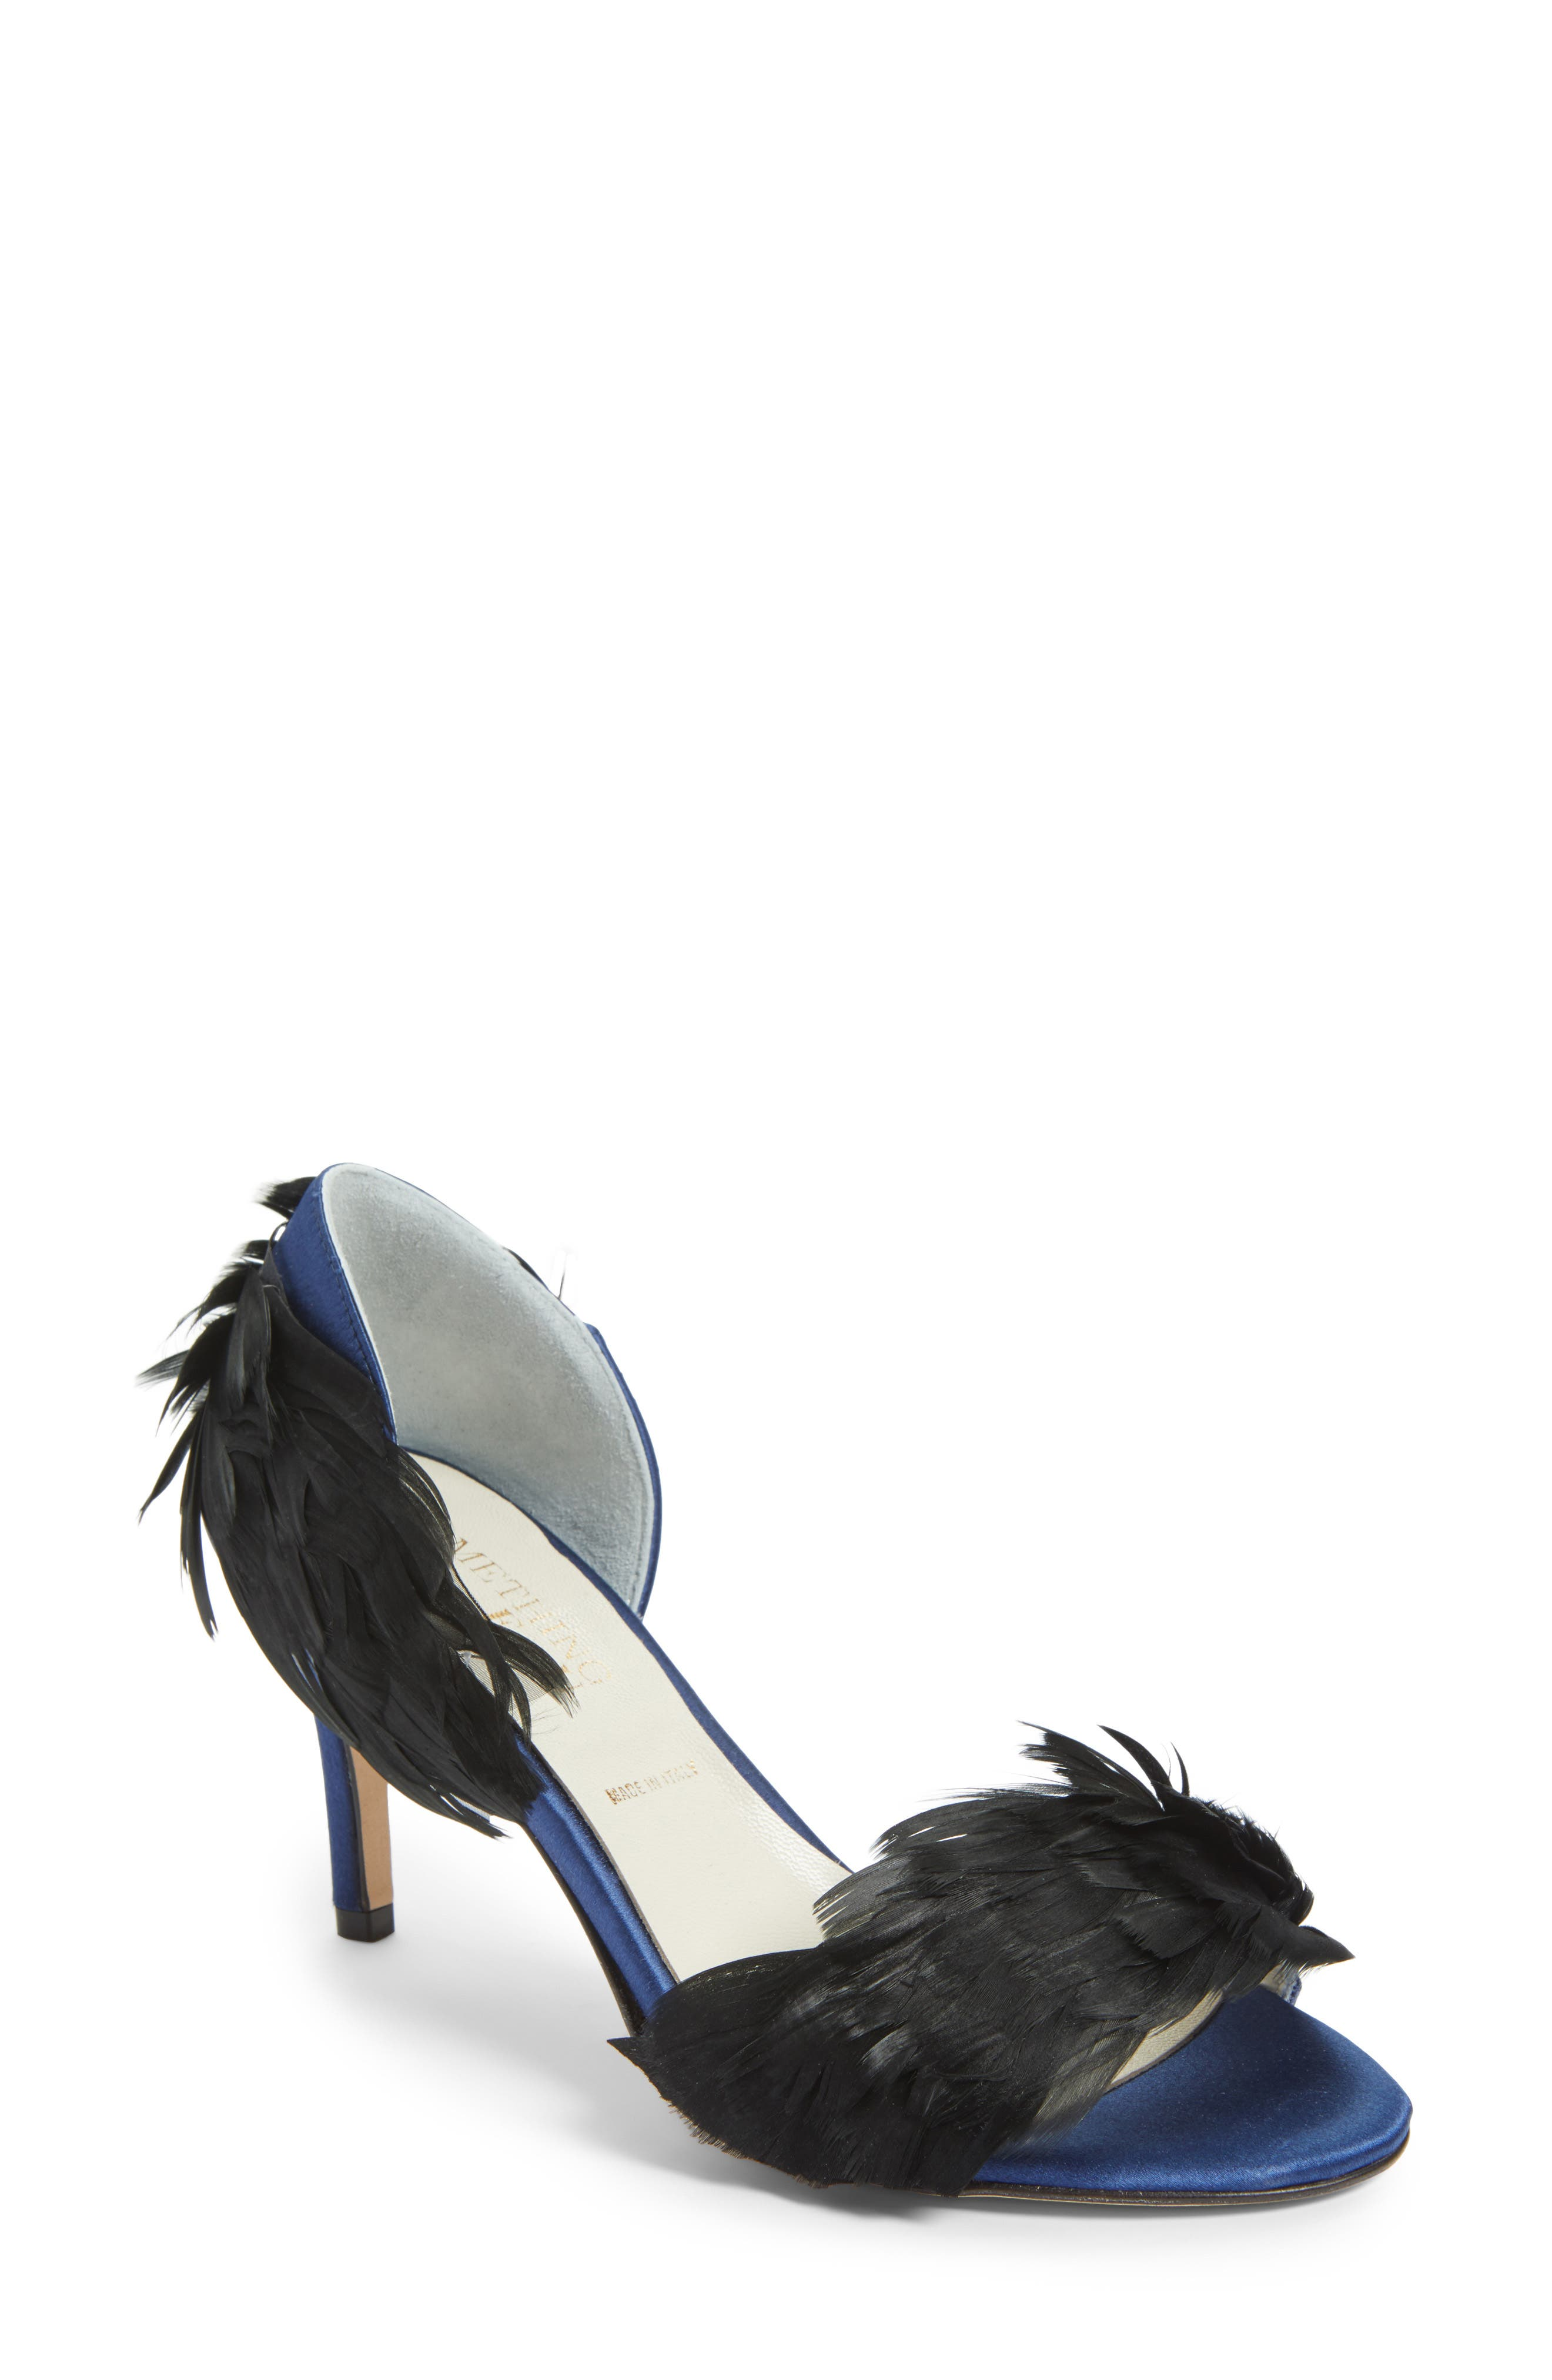 Main Image - Something Bleu Gigi d'Orsay Sandal (Women)